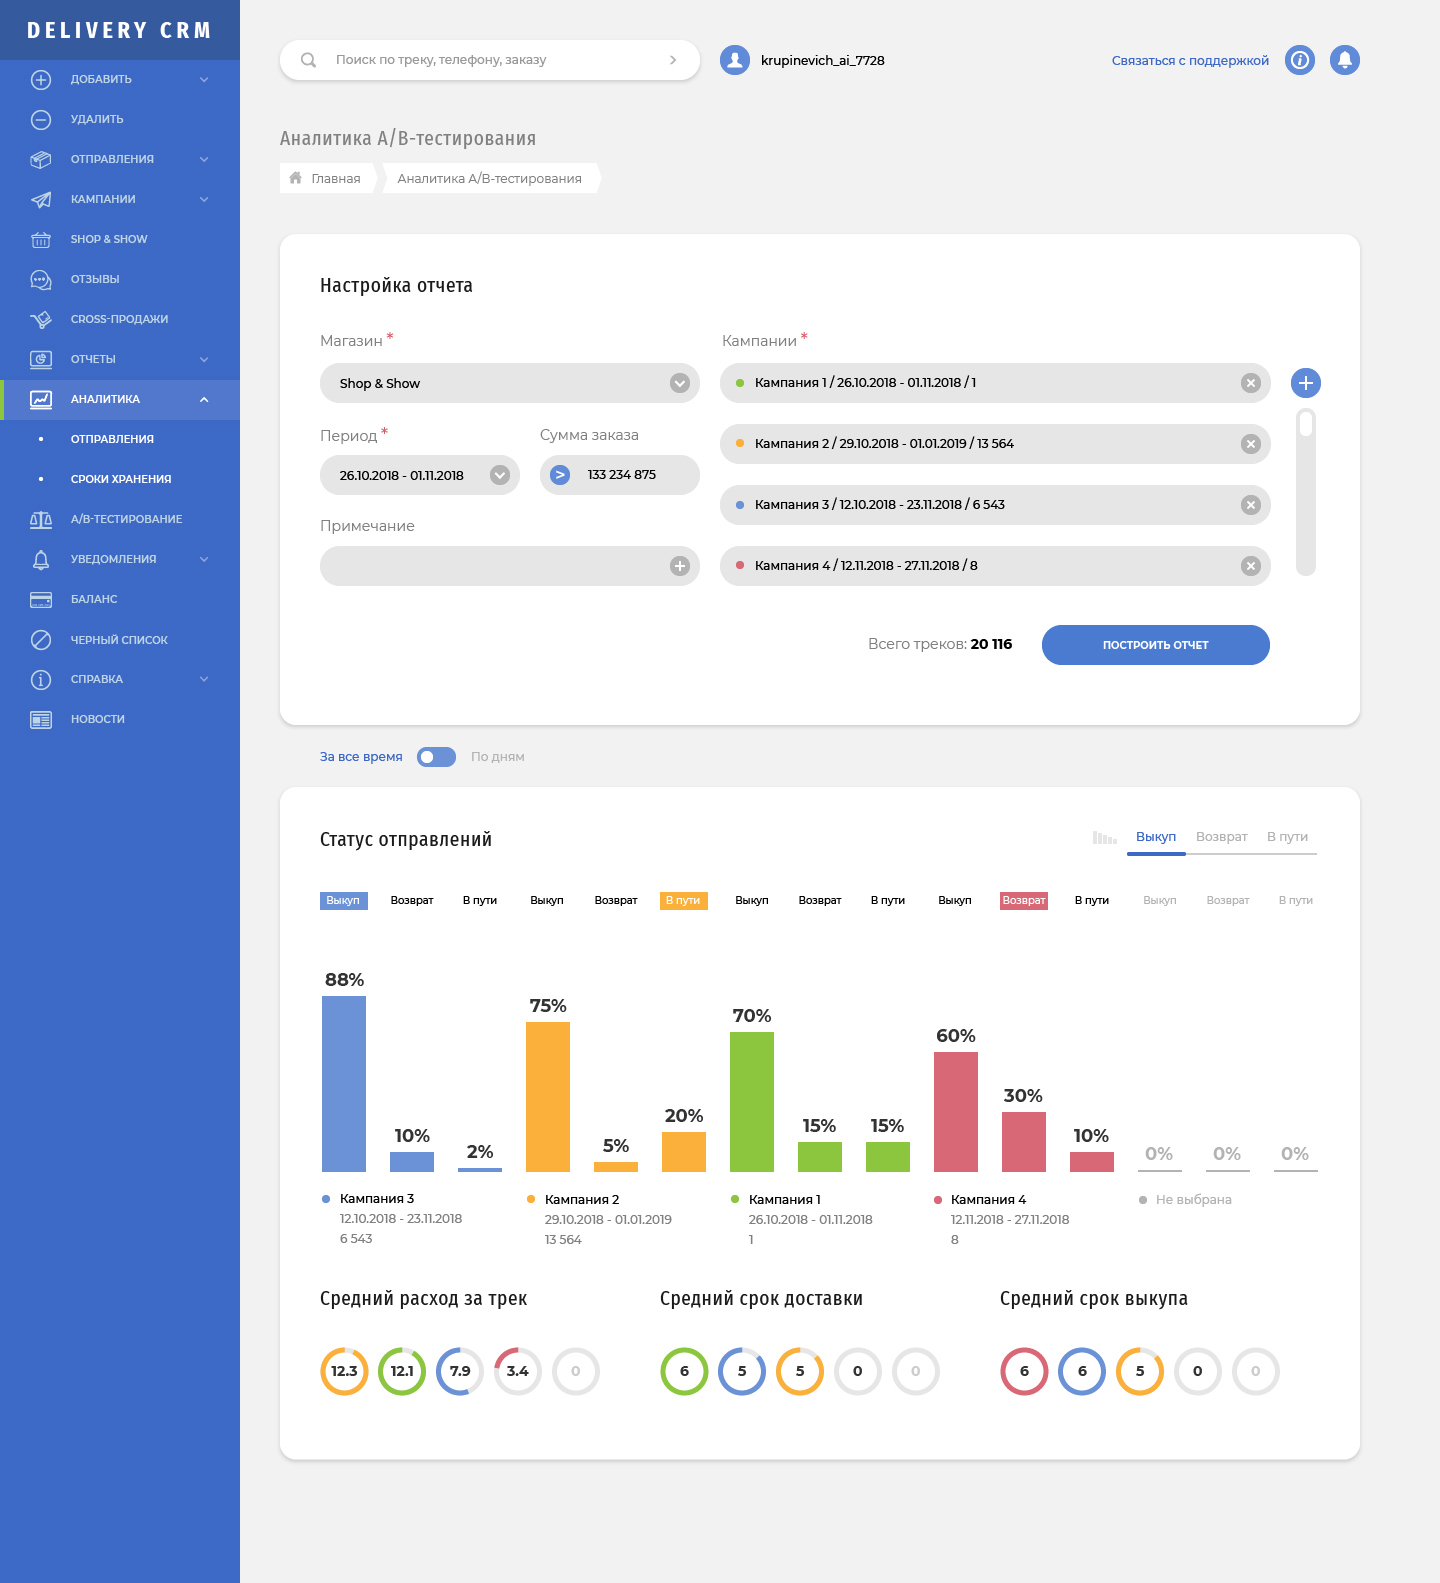 Дизайн страницы аналитики в ЛК Saas сервиса для e-com фото f_3035c053b083cc21.jpg